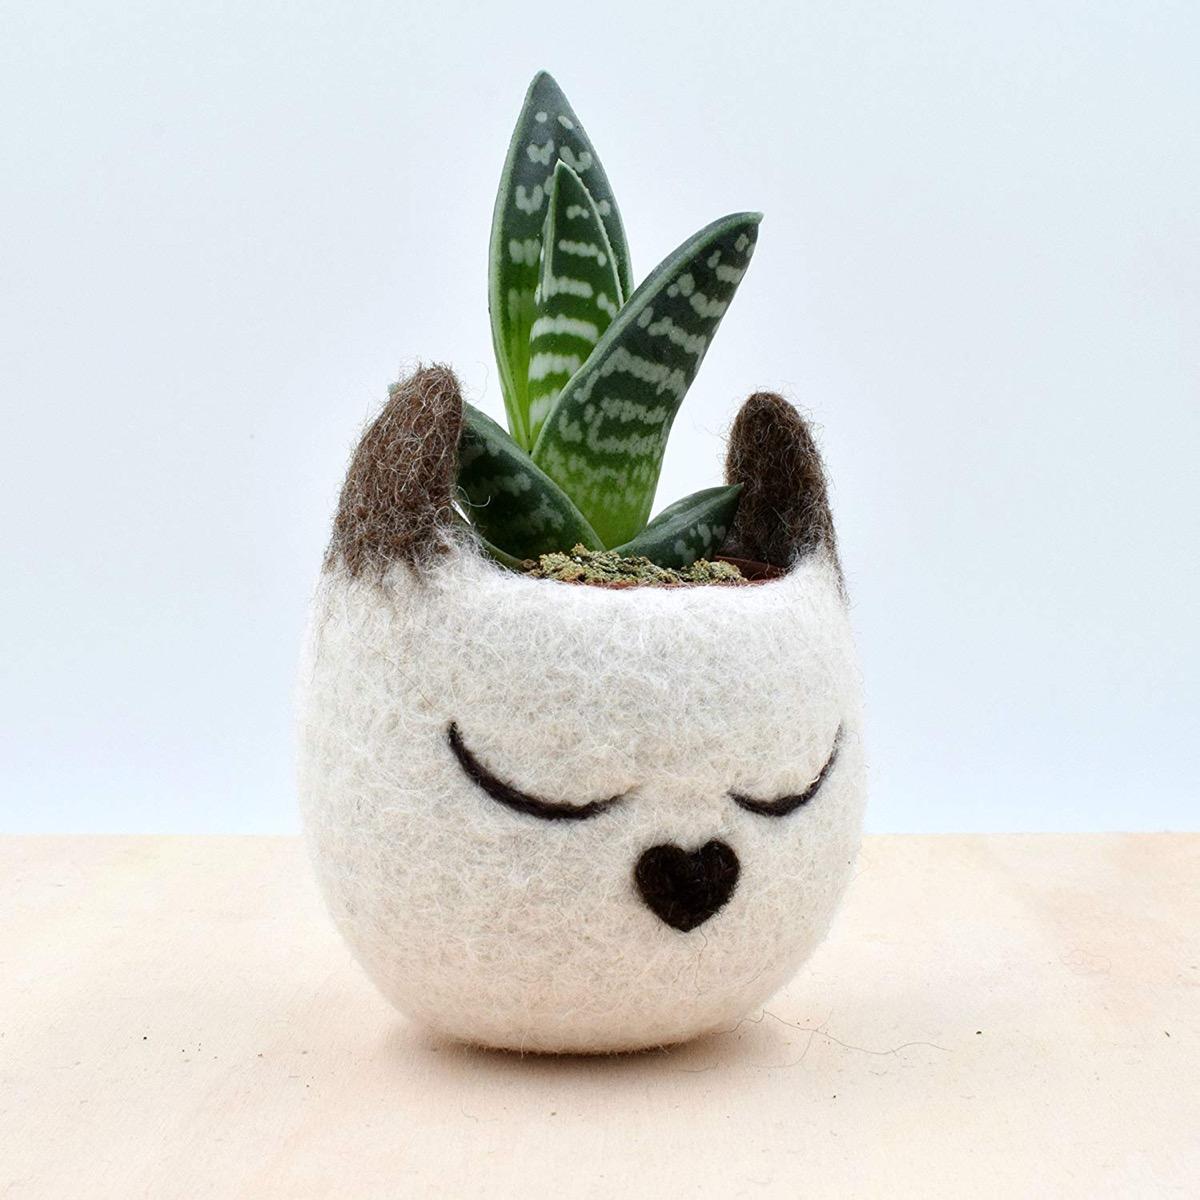 Siamese Cat Felt Planter {Handmade Items From Amazon}